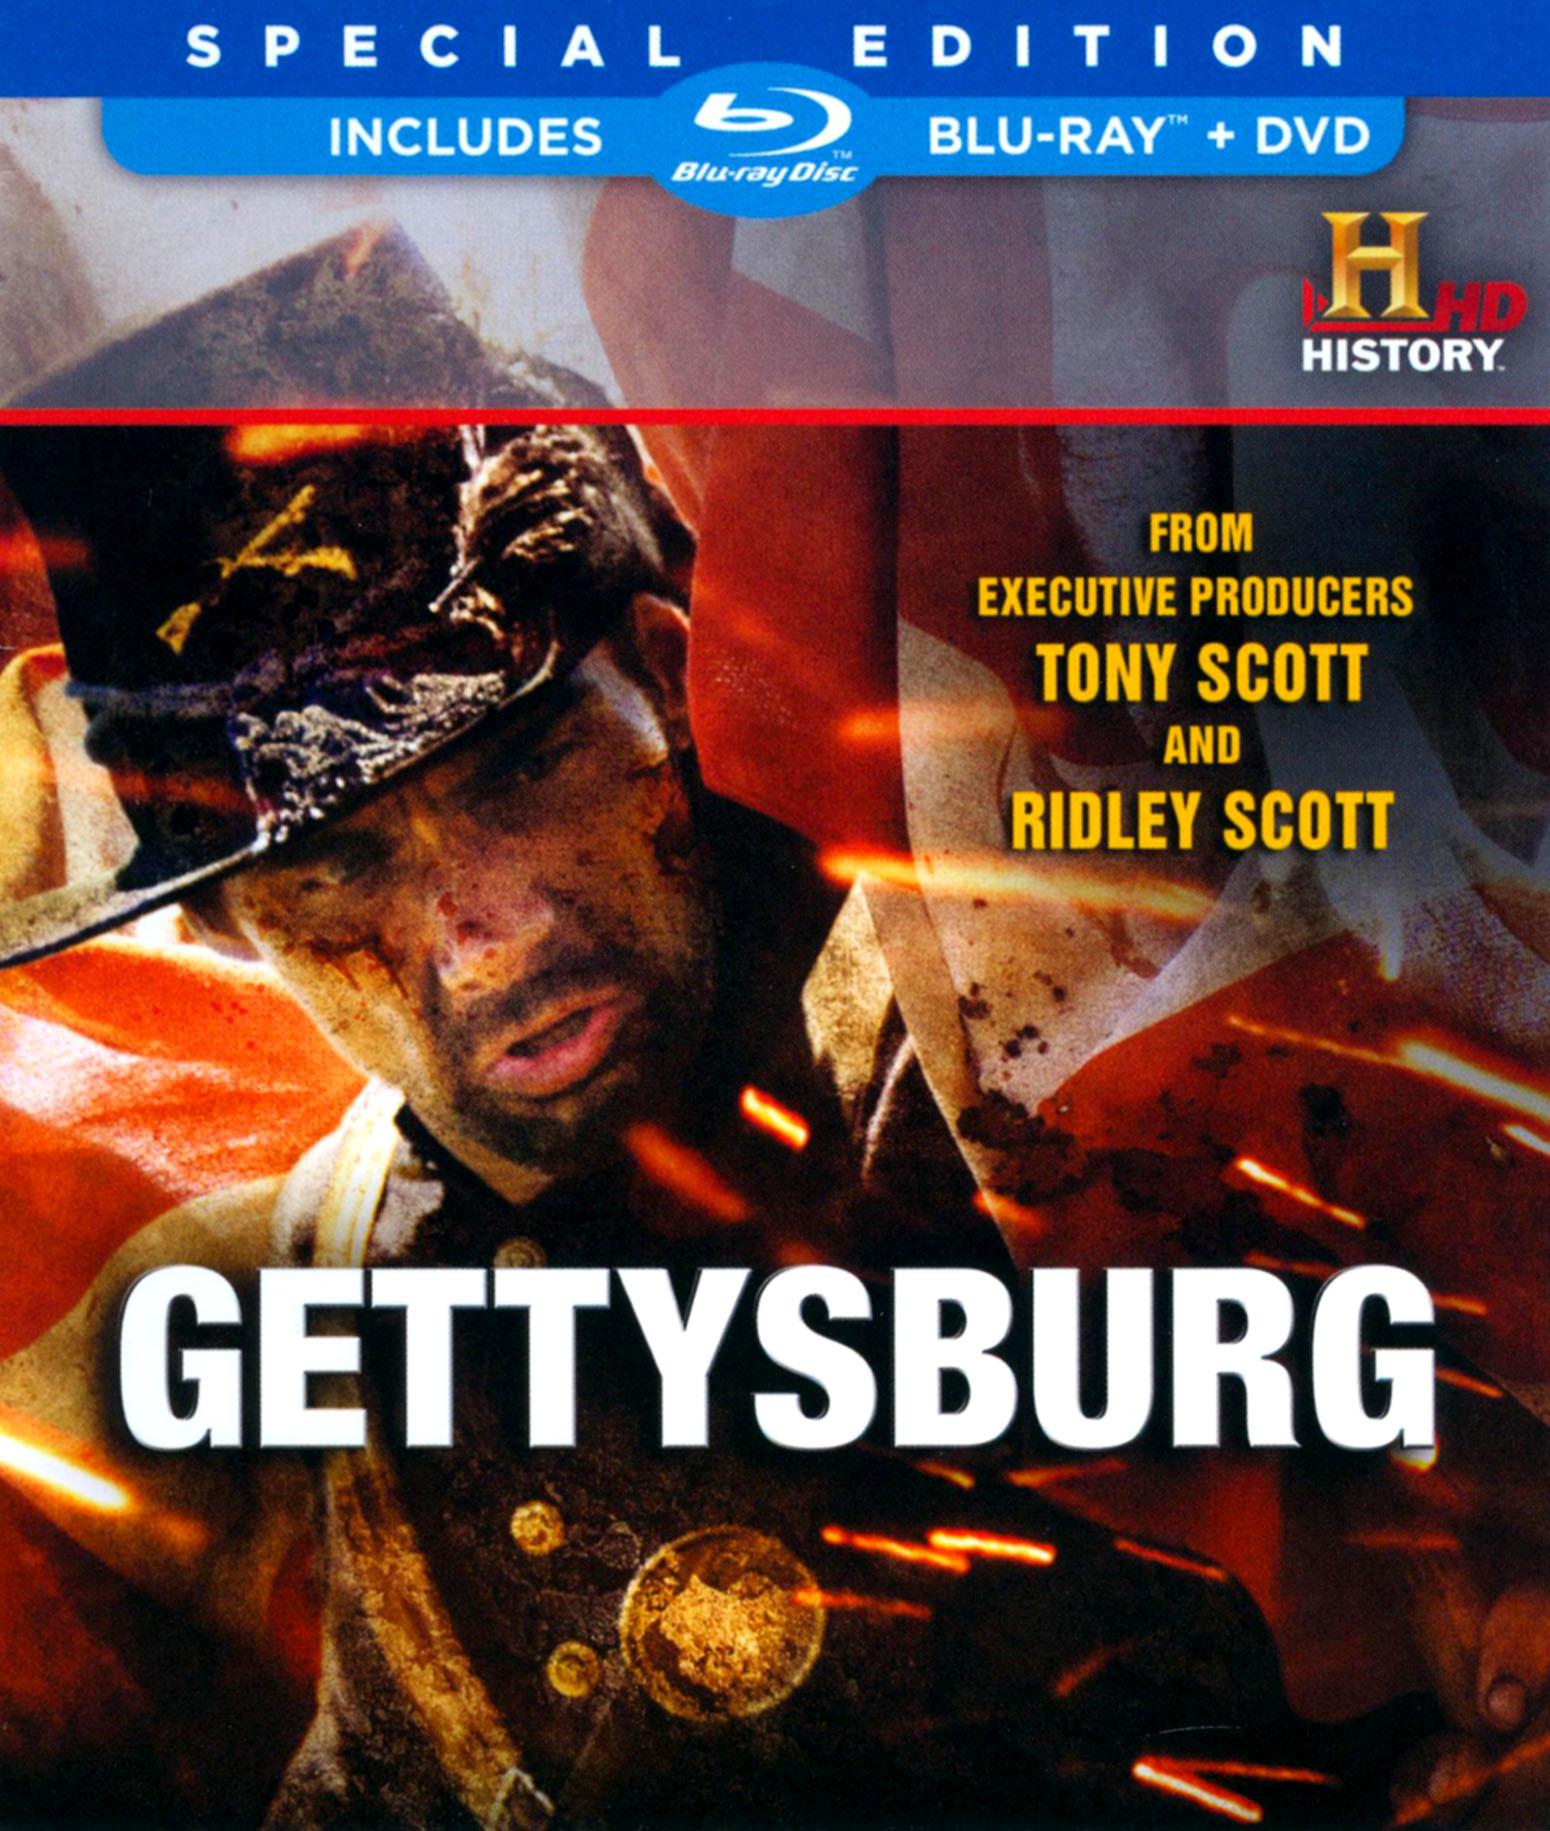 Gettysburg [2 Discs] [blu-ray/dvd] 3233908